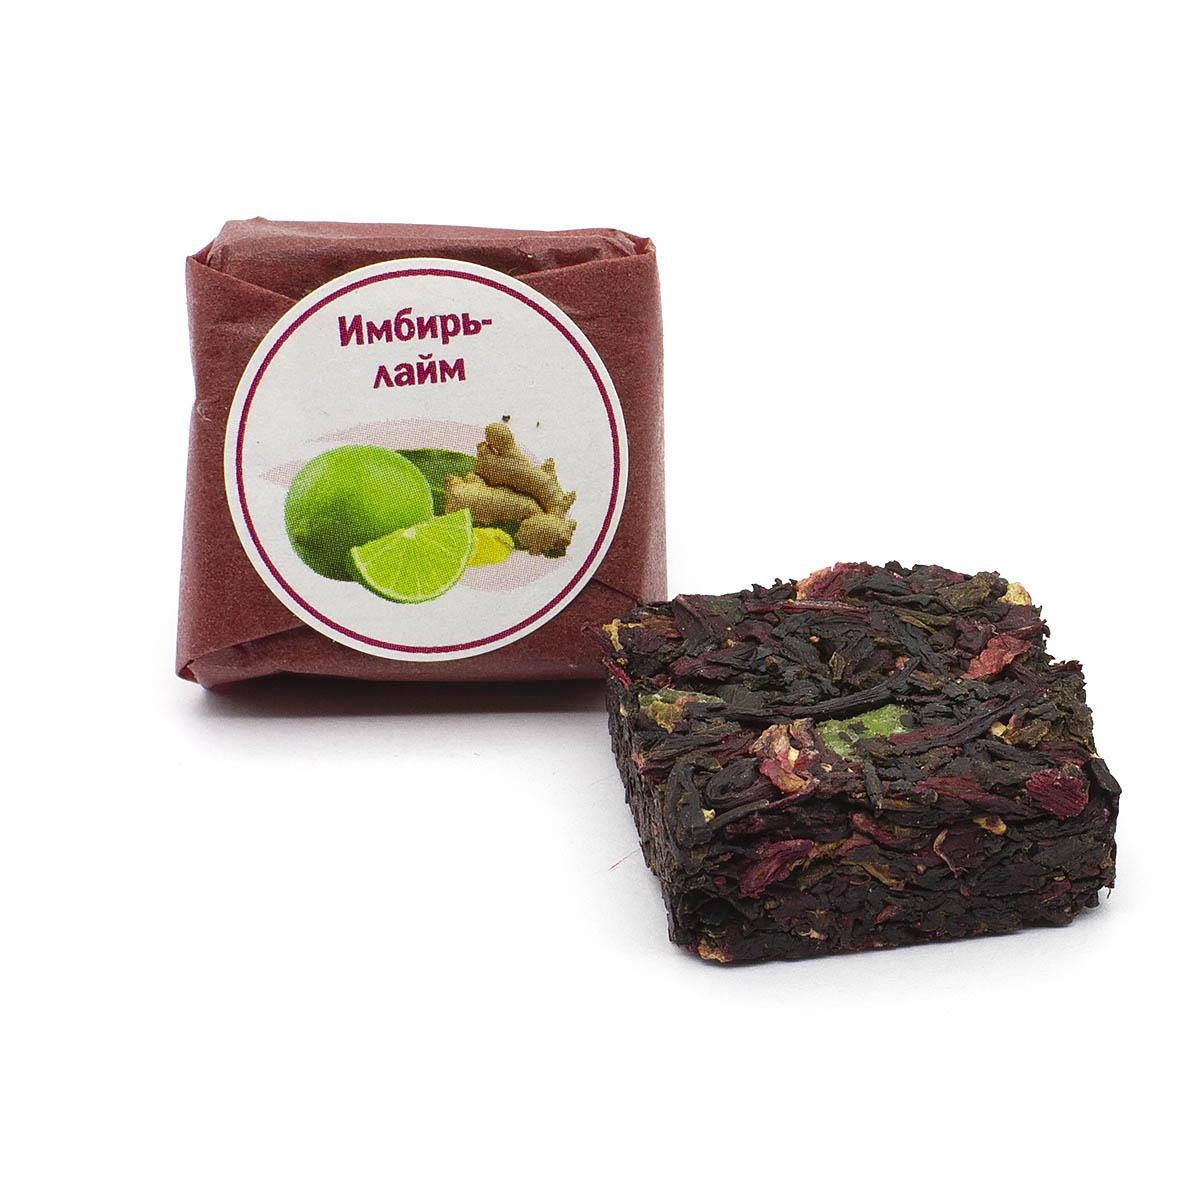 Чай фруктовый Имбирь-лайм, кубик 5-7 г